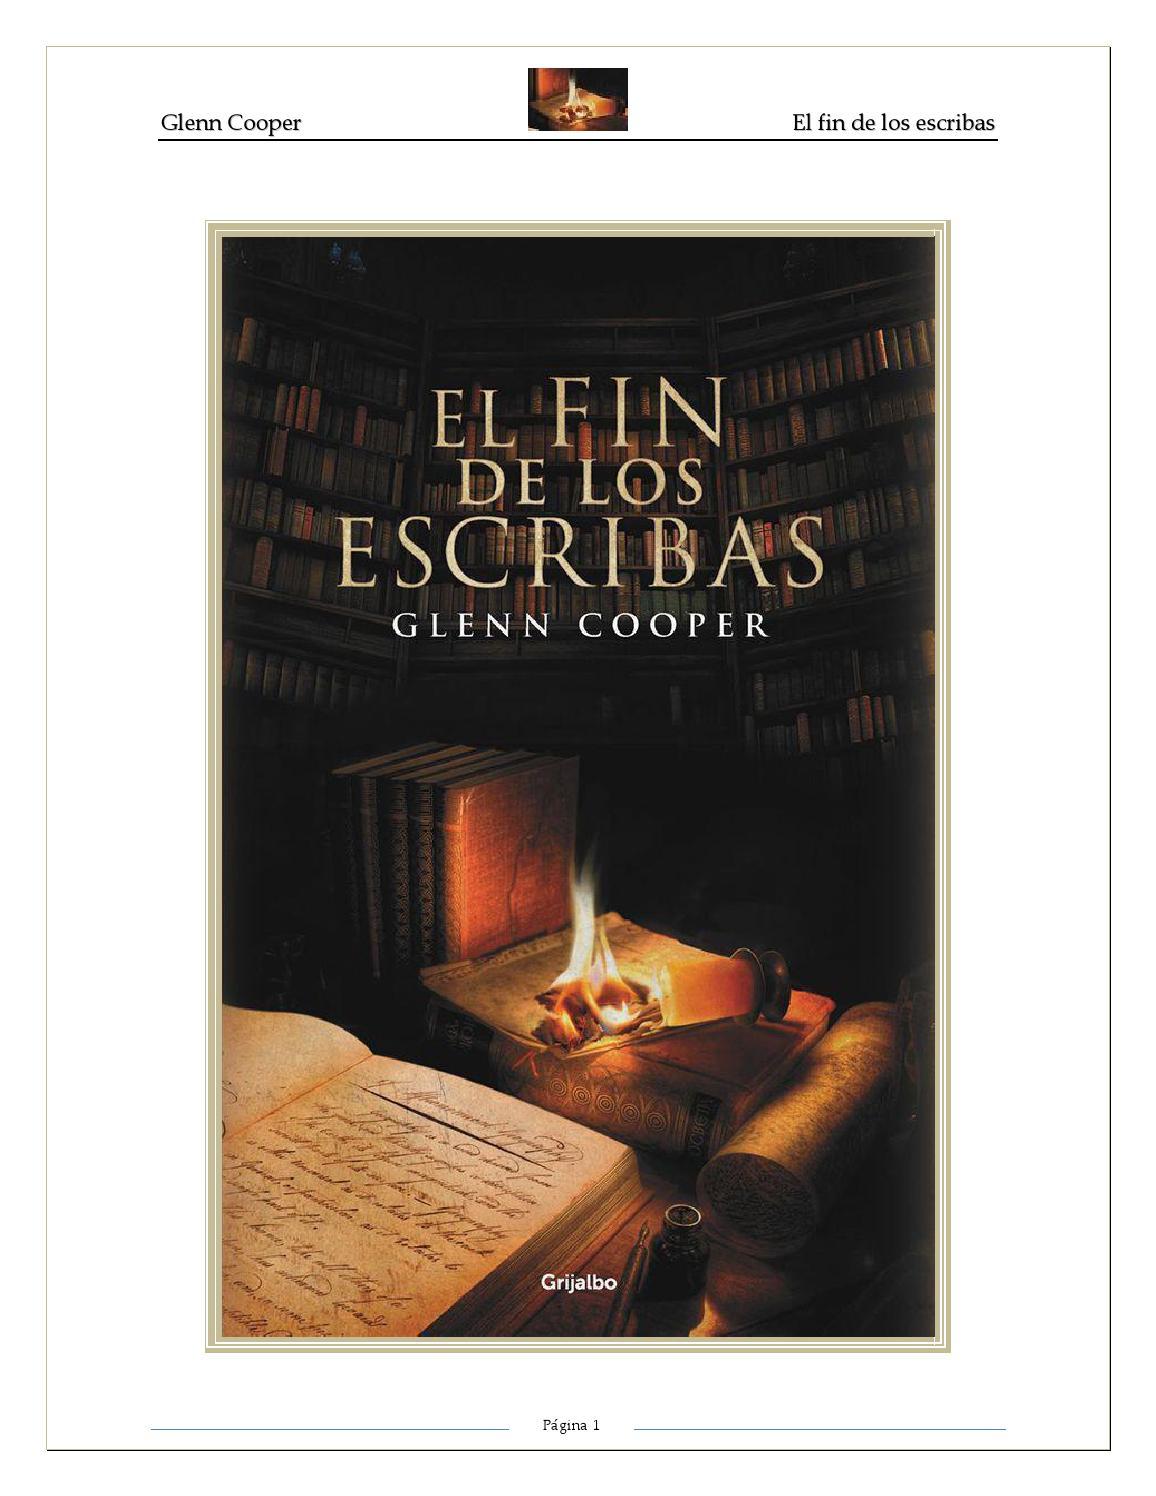 Biblioteca de los muertos  03 by EddyFle - issuu 5a012ceaf357